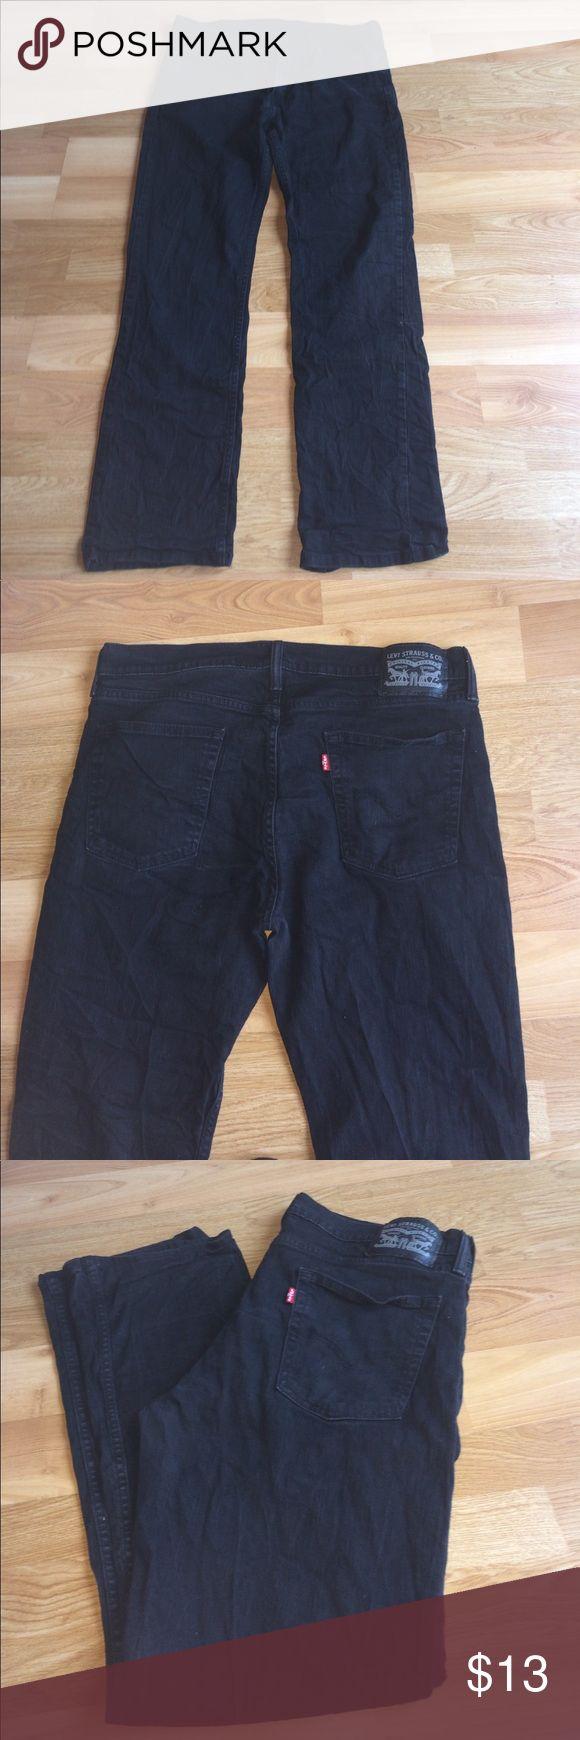 Levi strass & co jeans Black levis jeans Levi's Jeans Straight